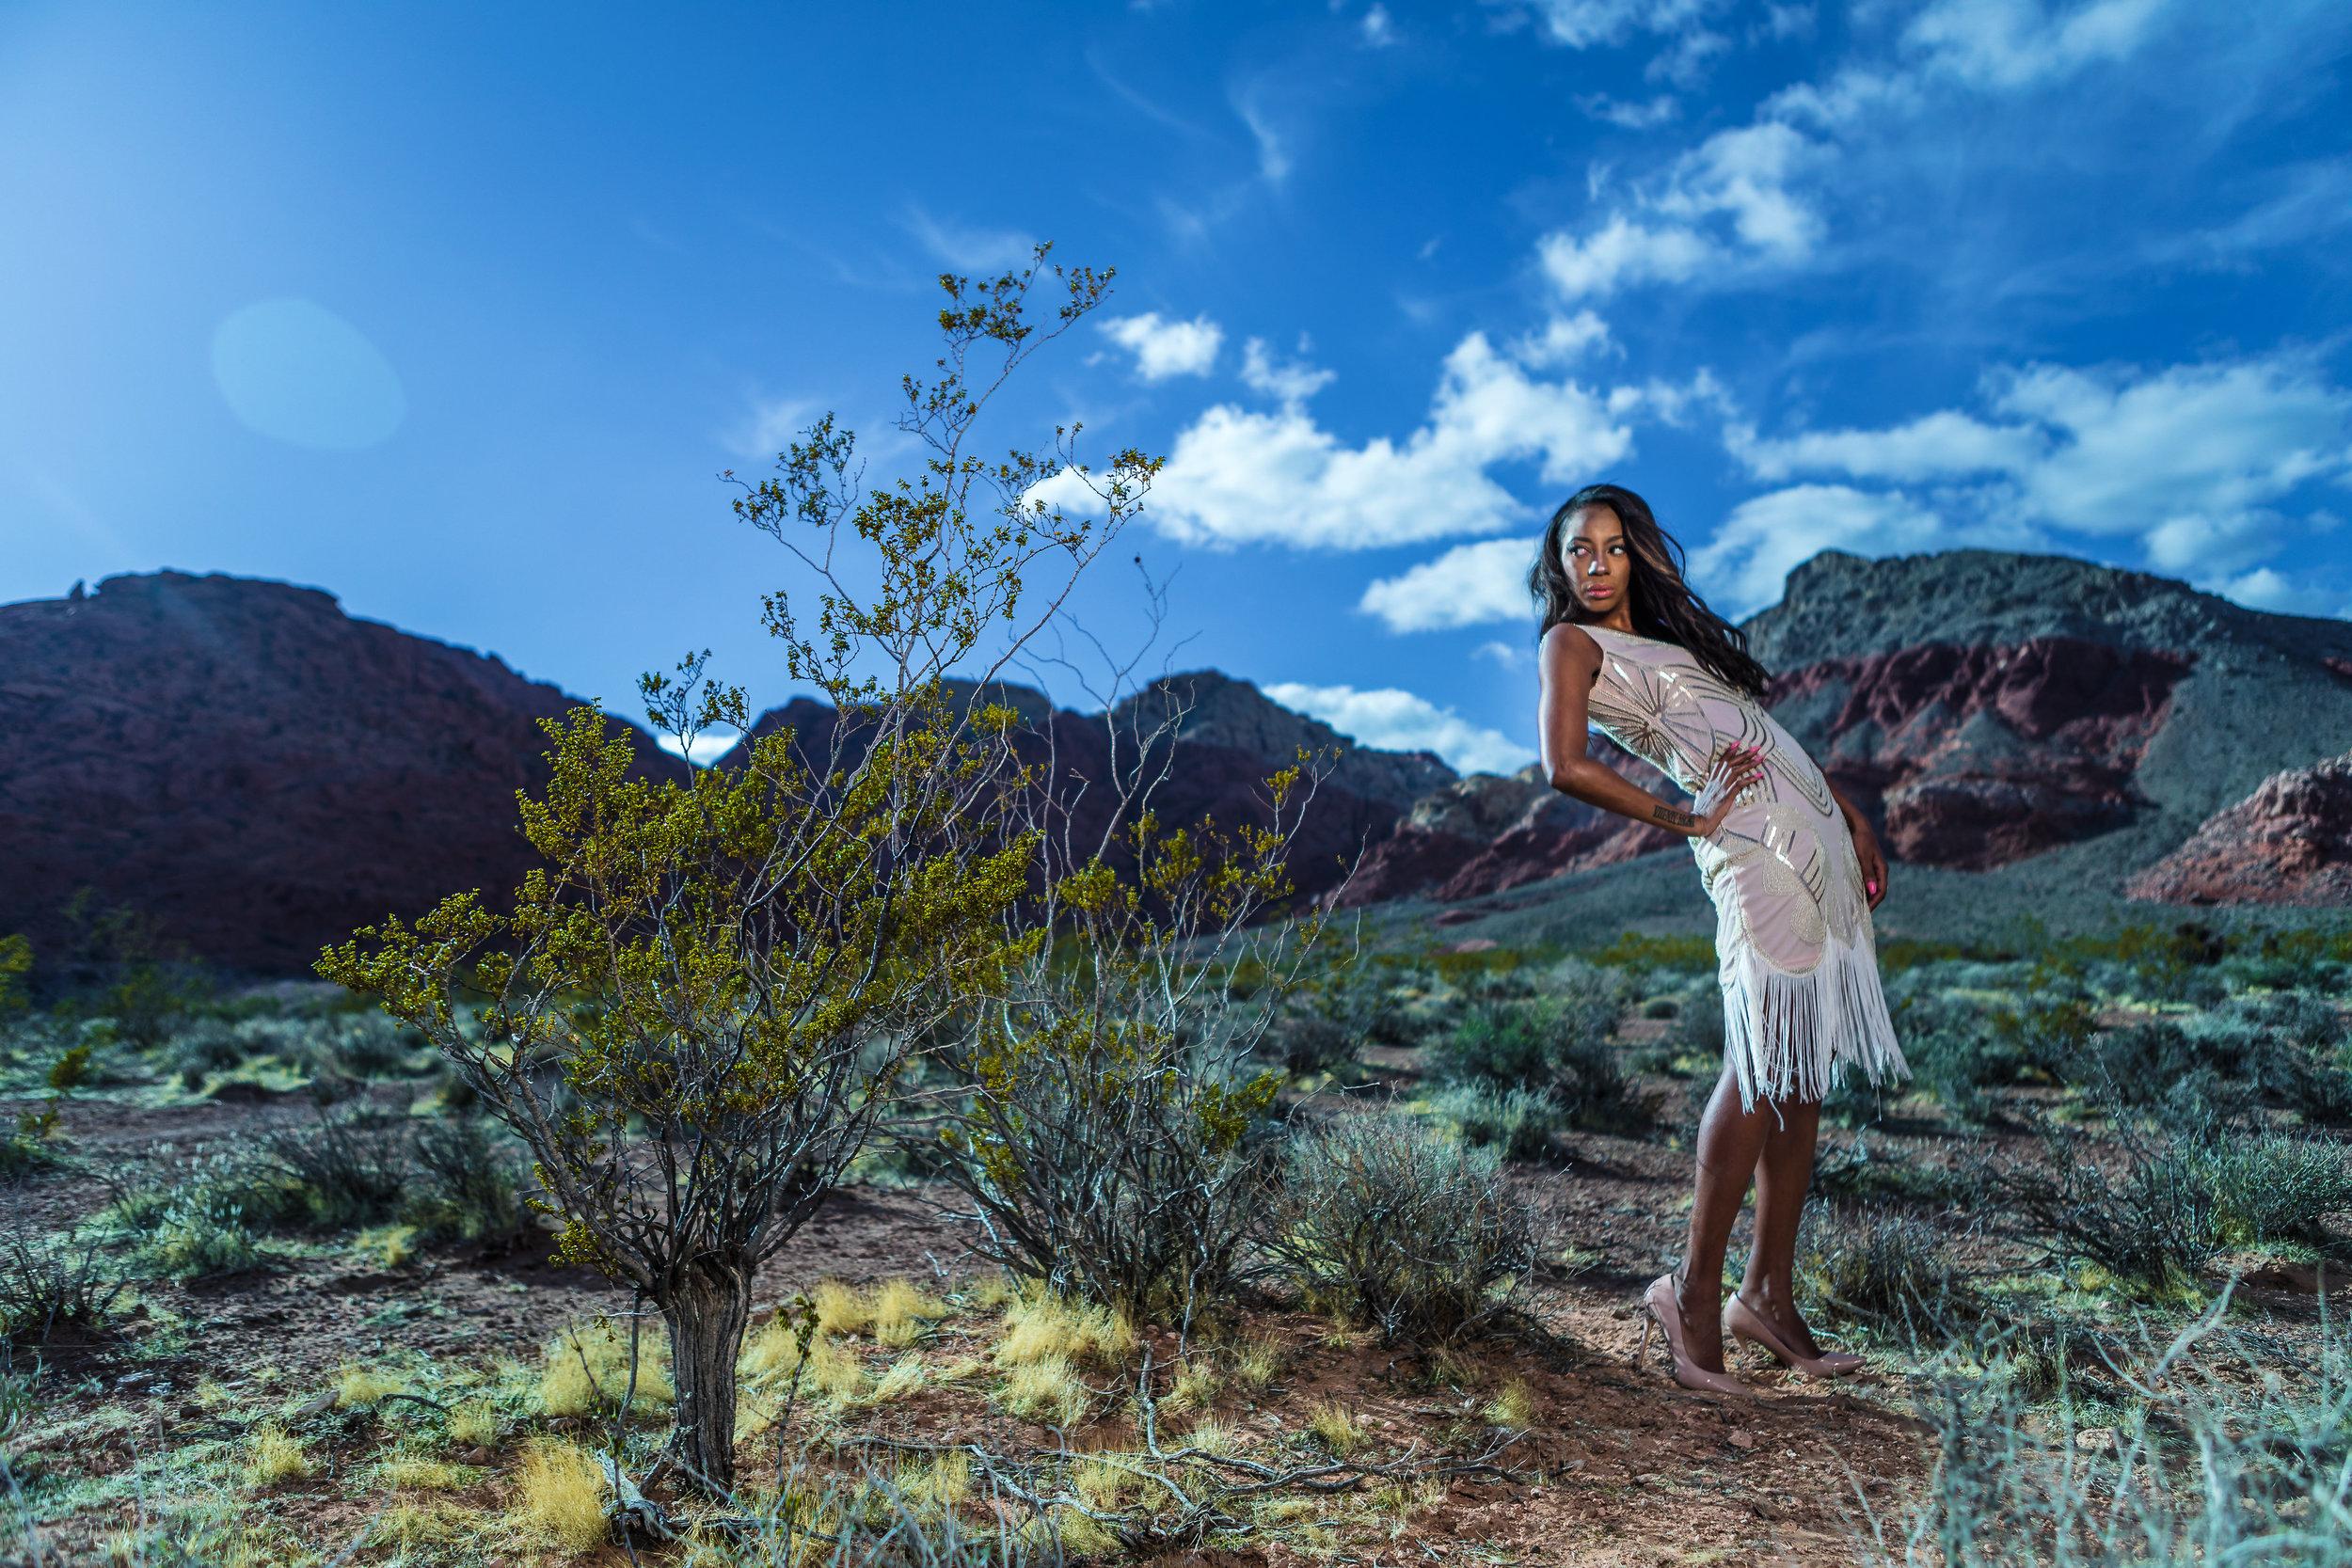 New_York_Photographer_Las_Vegas_Desert-149.jpg